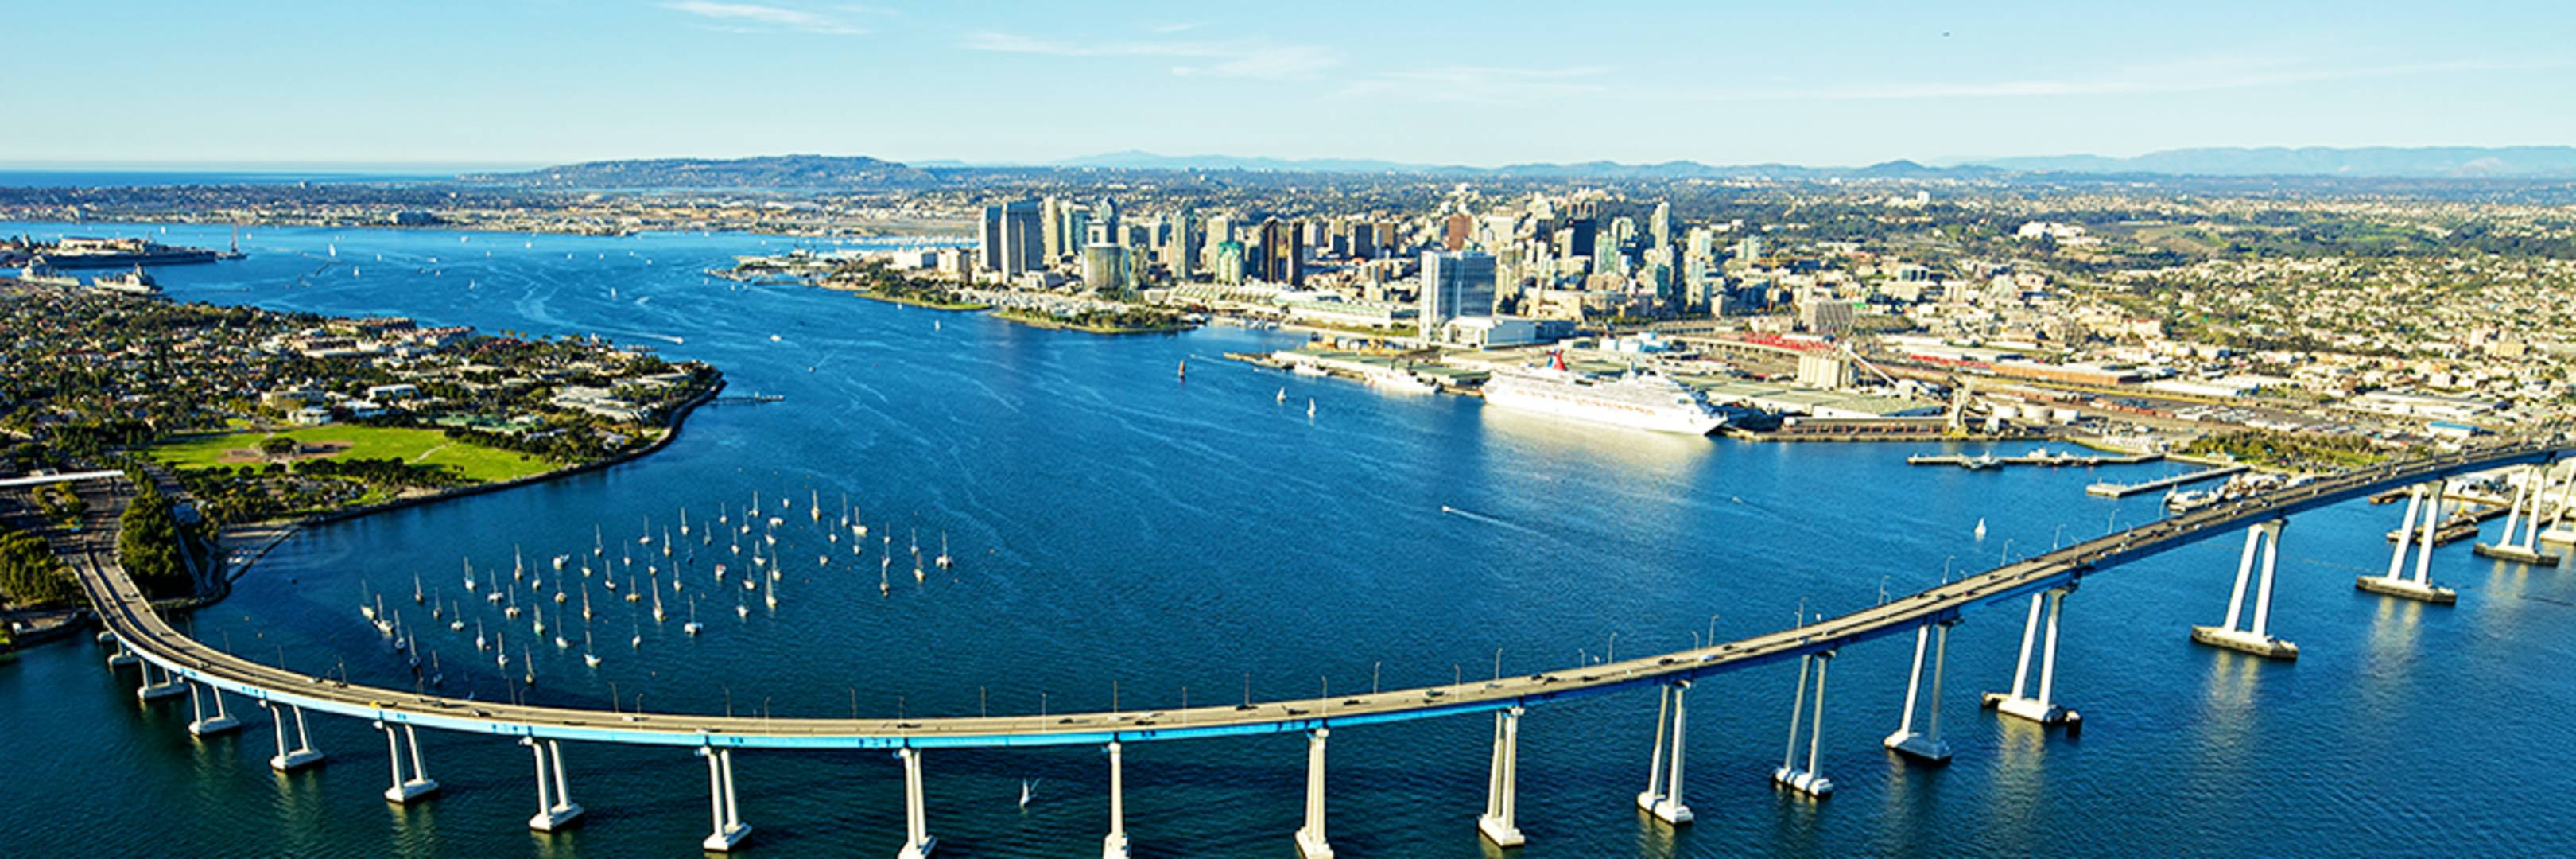 San diego historical photos San Diego Navy History - Quarterdeck. org